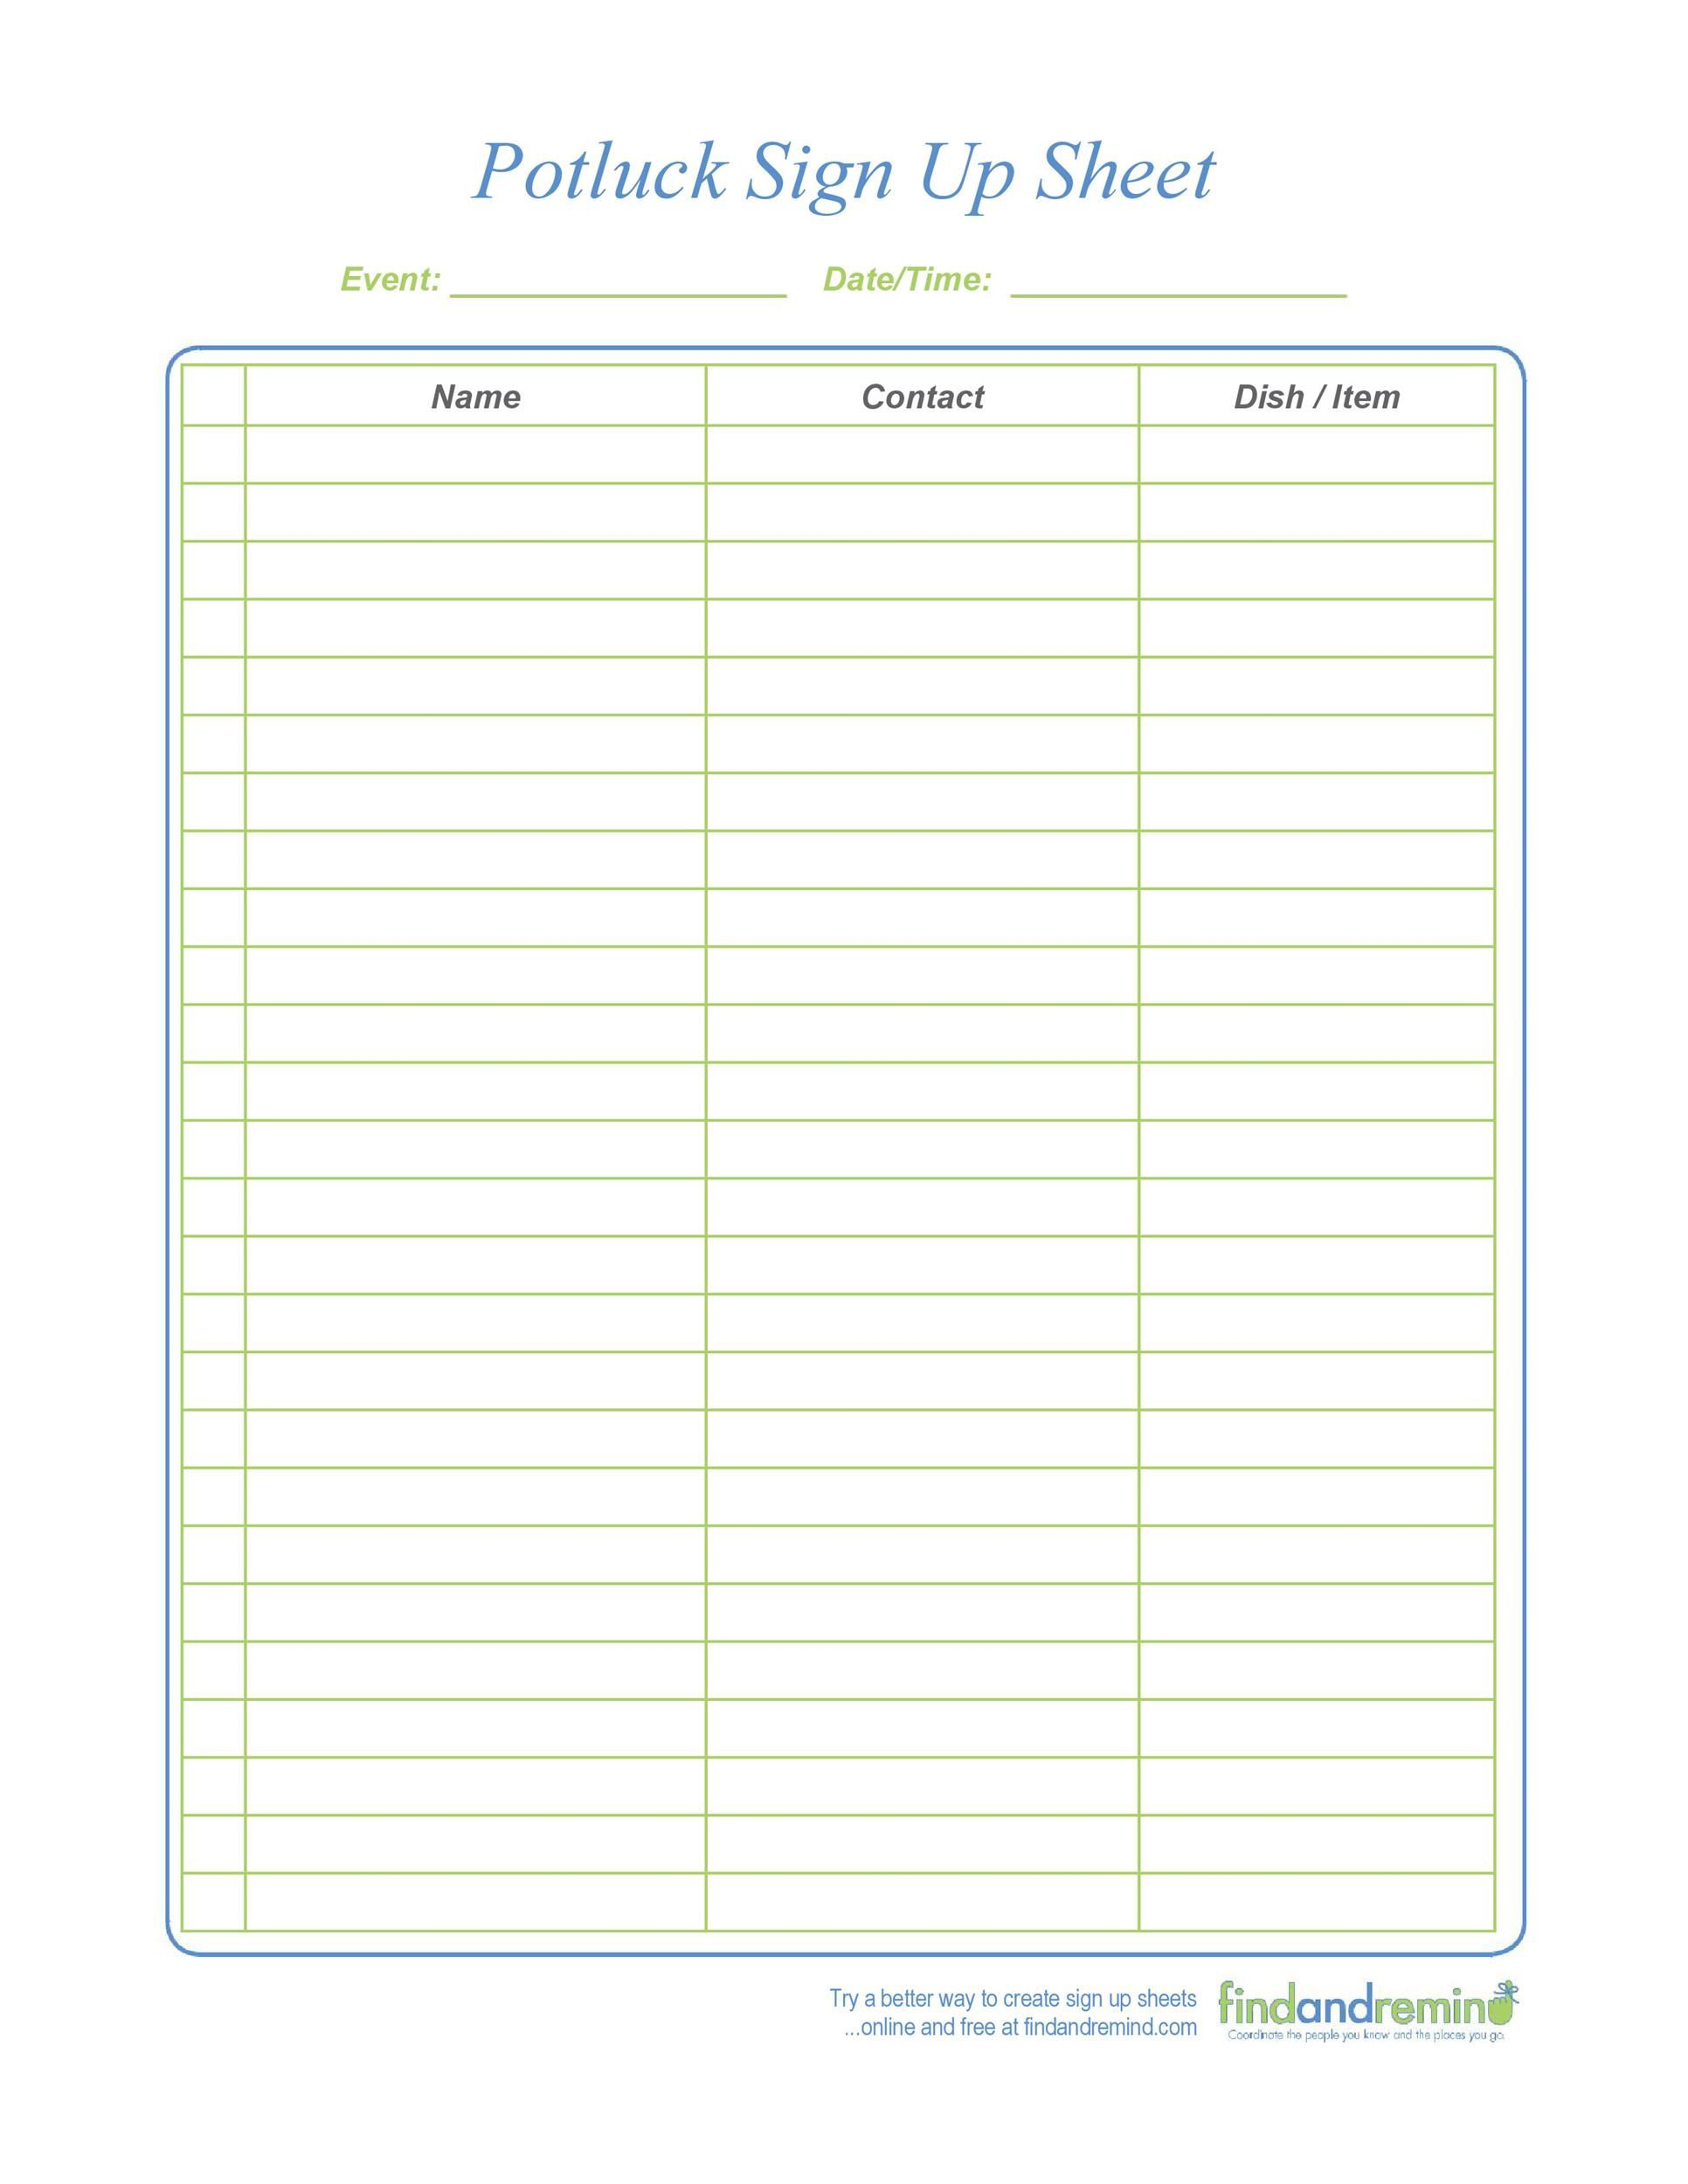 007 Unique Potluck Sign Up Sheet Template Image  Pdf Google Doc Free PrintableFull